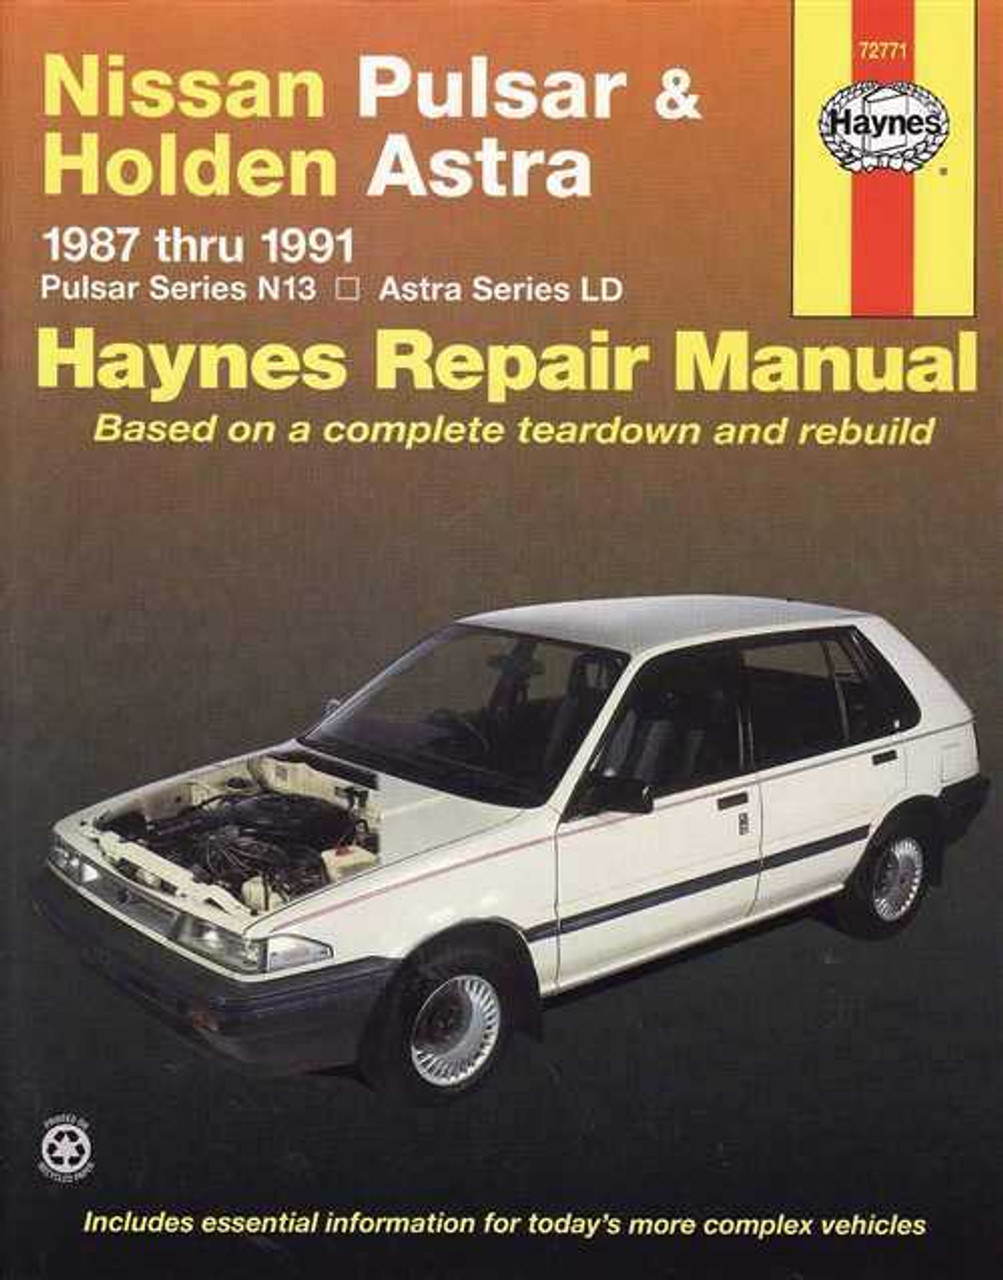 nissan pulsar amp holden astra 1987 1991 workshop manual rh automotobookshop com au Nissan Pulsar NX 1985 Nissan Pulsar